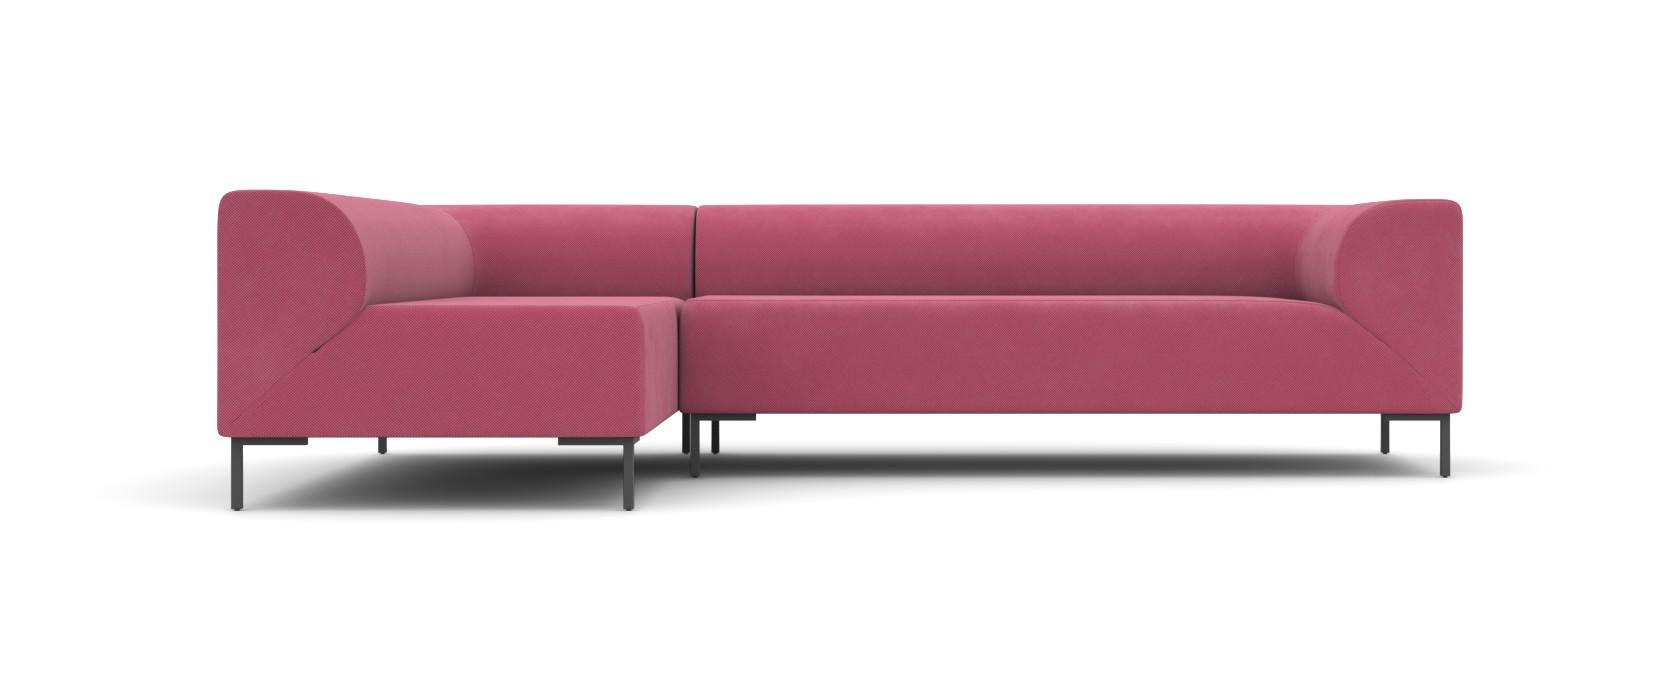 Кутовий диван Fernando - Pufetto